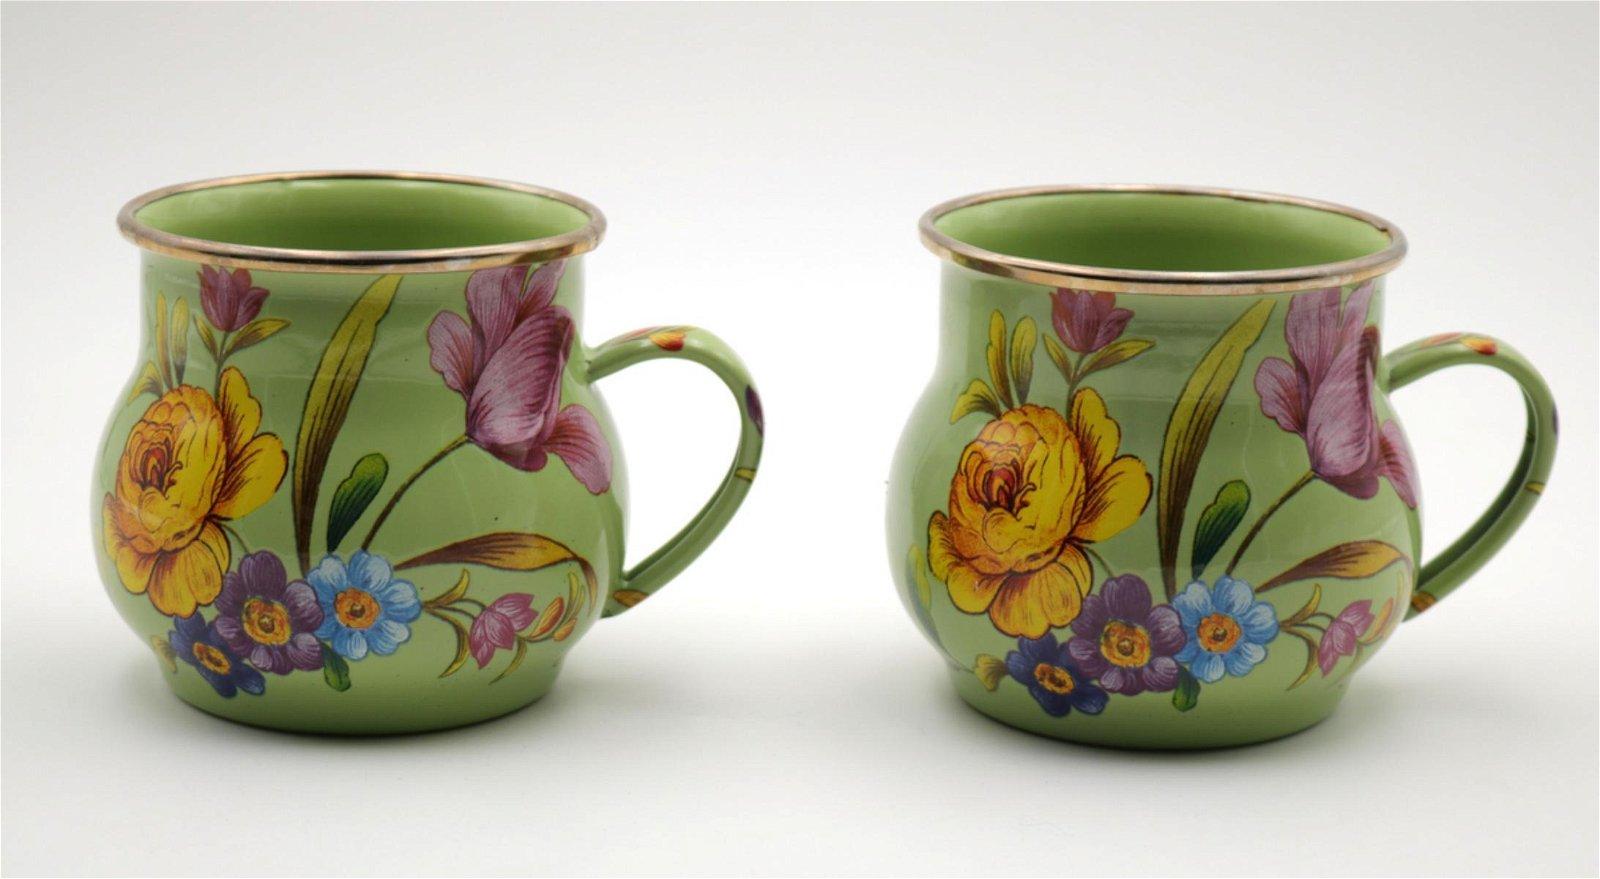 Mackenzie Childs Floral Mugs